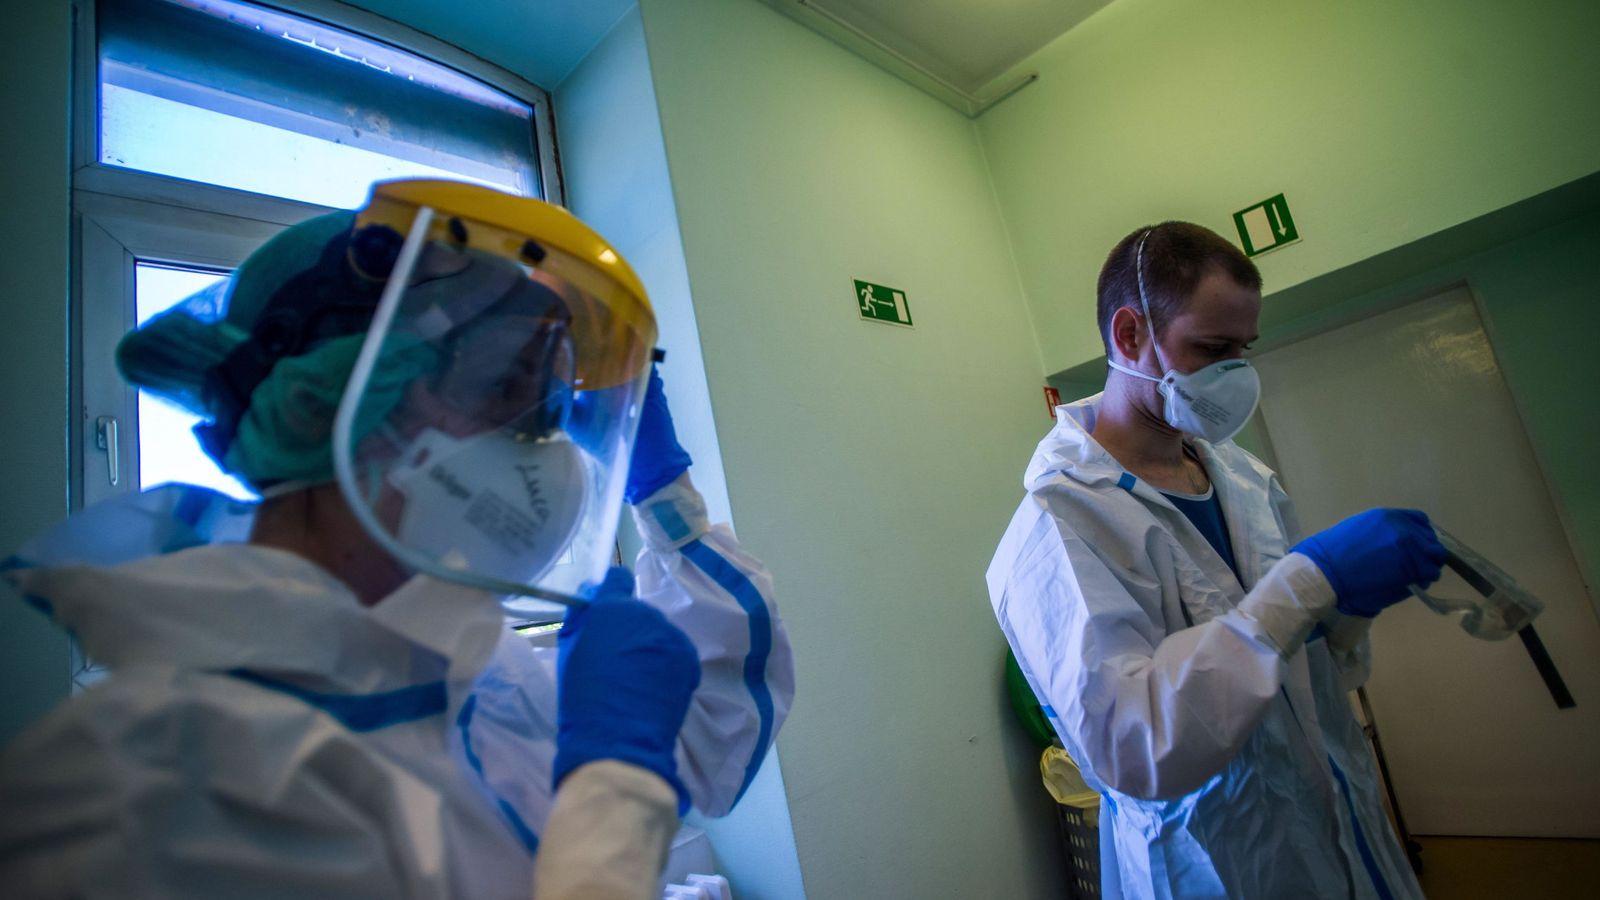 Francia estudia usar parches de nicotina en pacientes de covid-19 ...